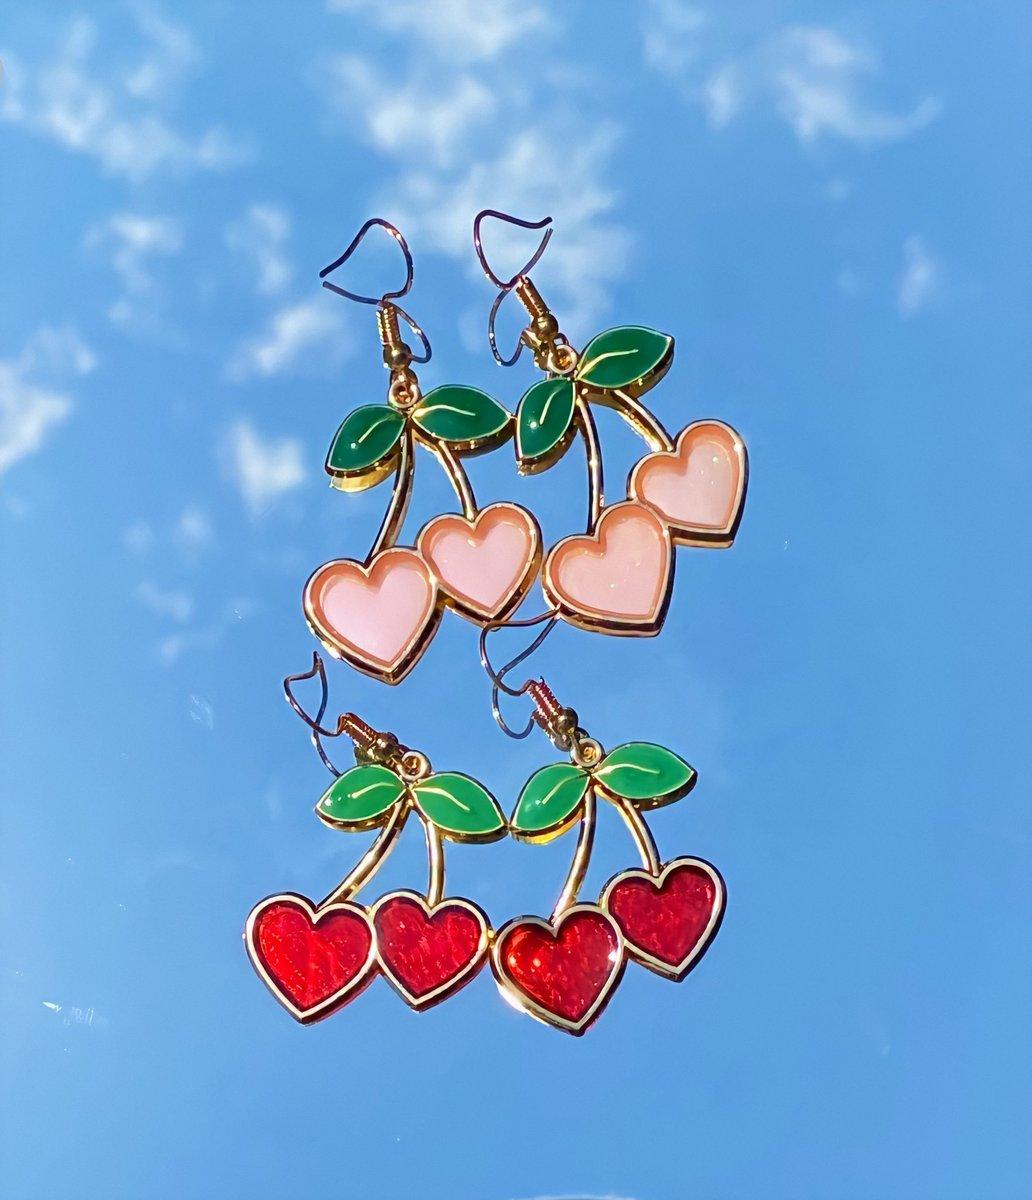 hii i sell cute affordable jewelry on http://autonomyjewels.com pic.twitter.com/relIh1eBpY